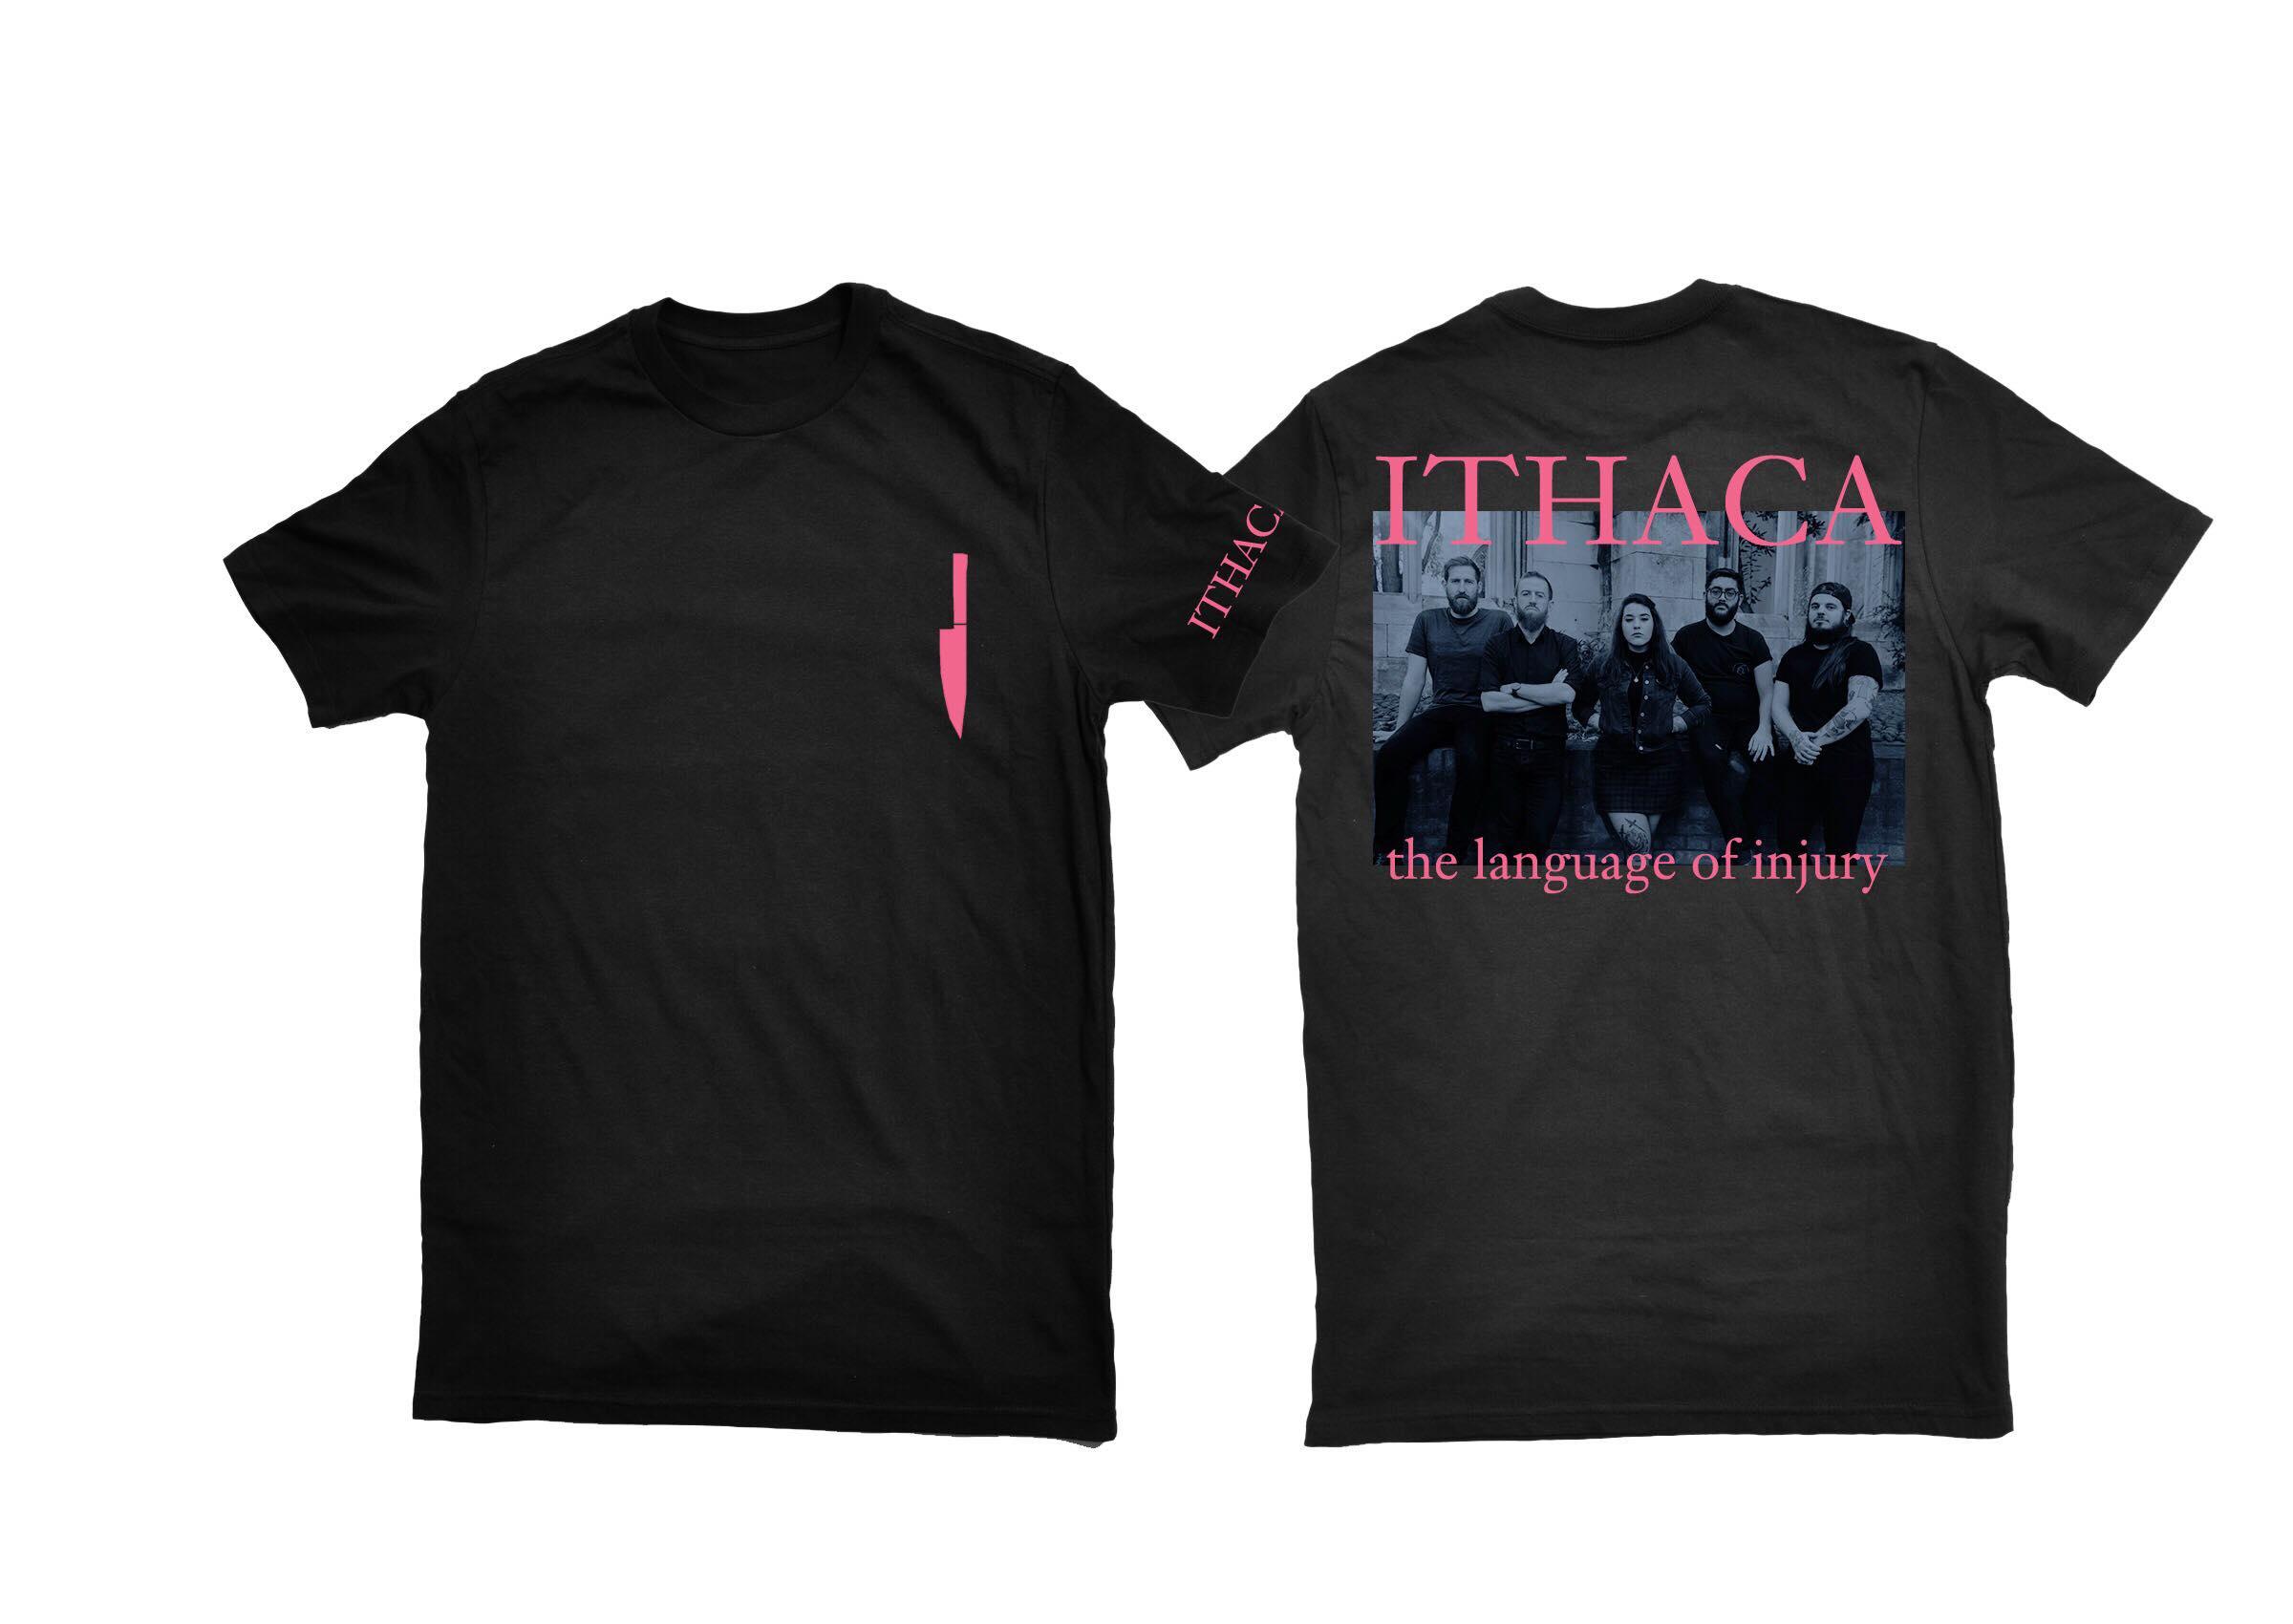 ITHACA - The Language of Injury shirt PREORDER